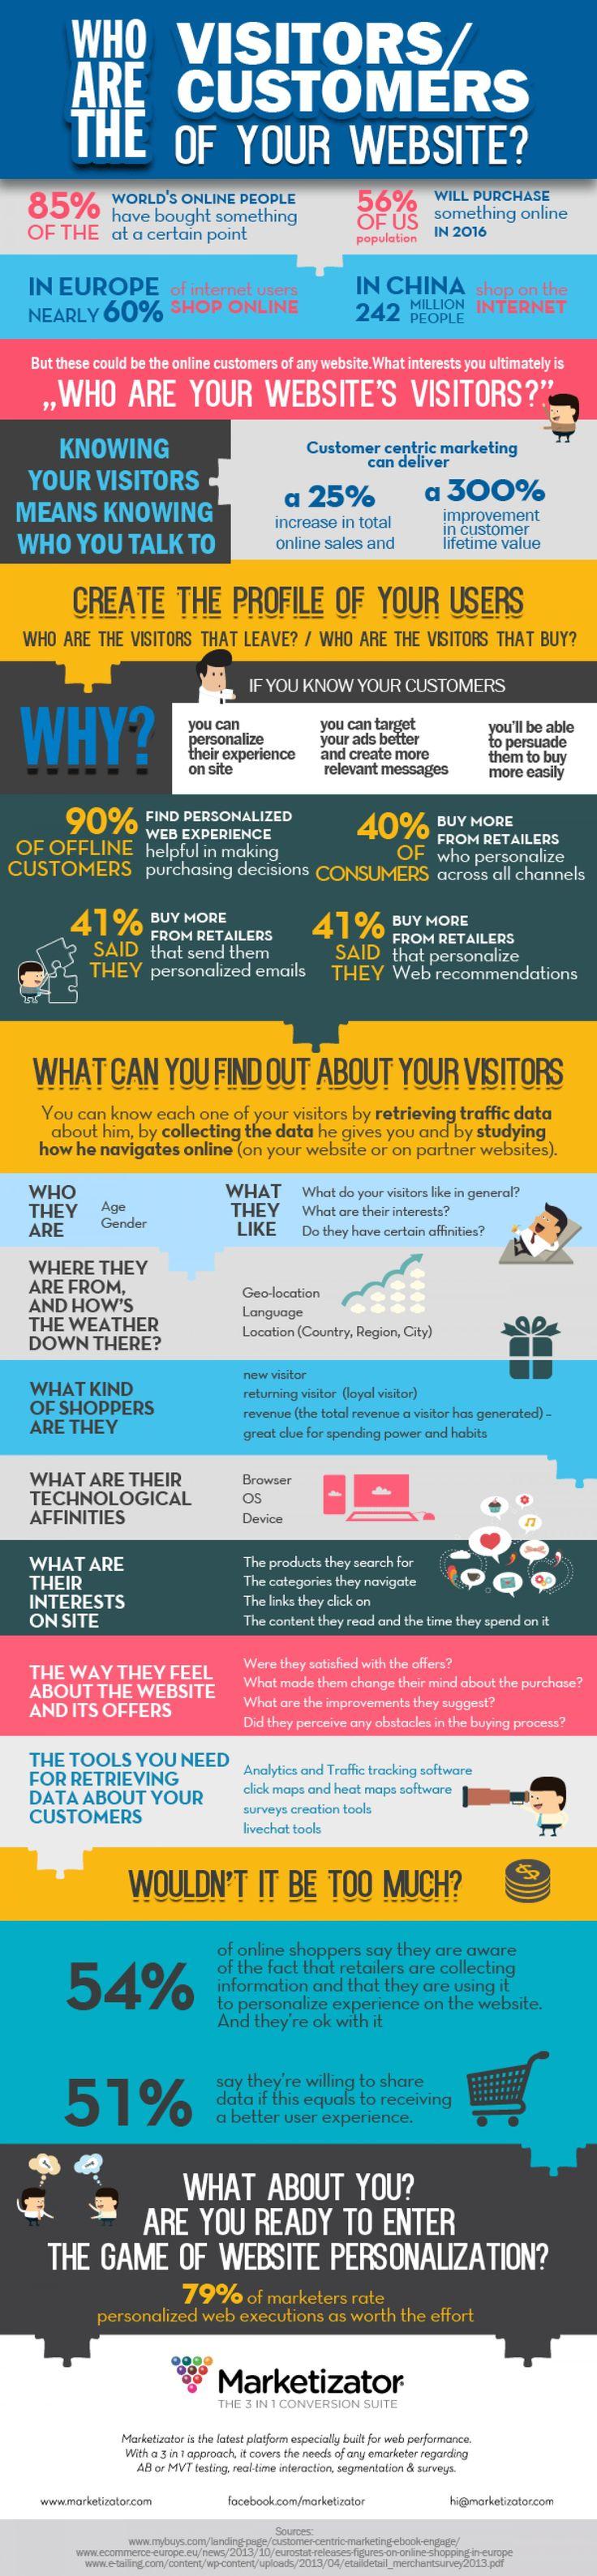 21 best Digital Idea images on Pinterest | Social media marketing ...